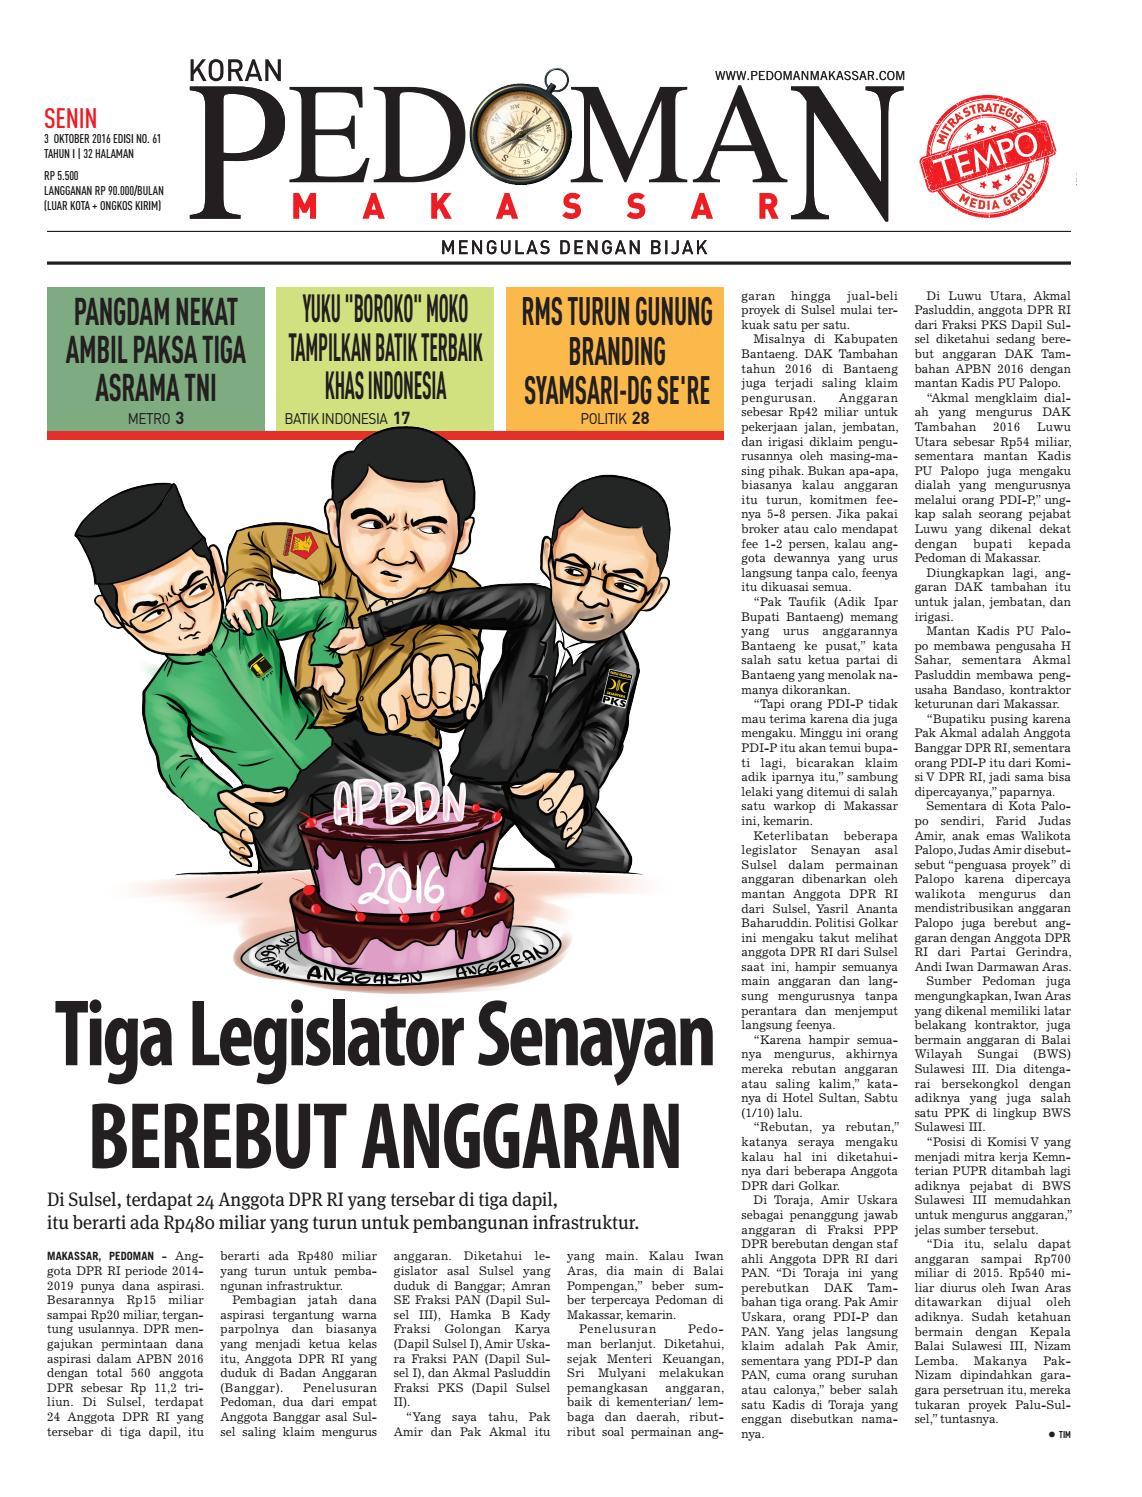 Edisi 61 3 Oktober 2016 Pedoman Makassar By Pedoman Makassar Issuu